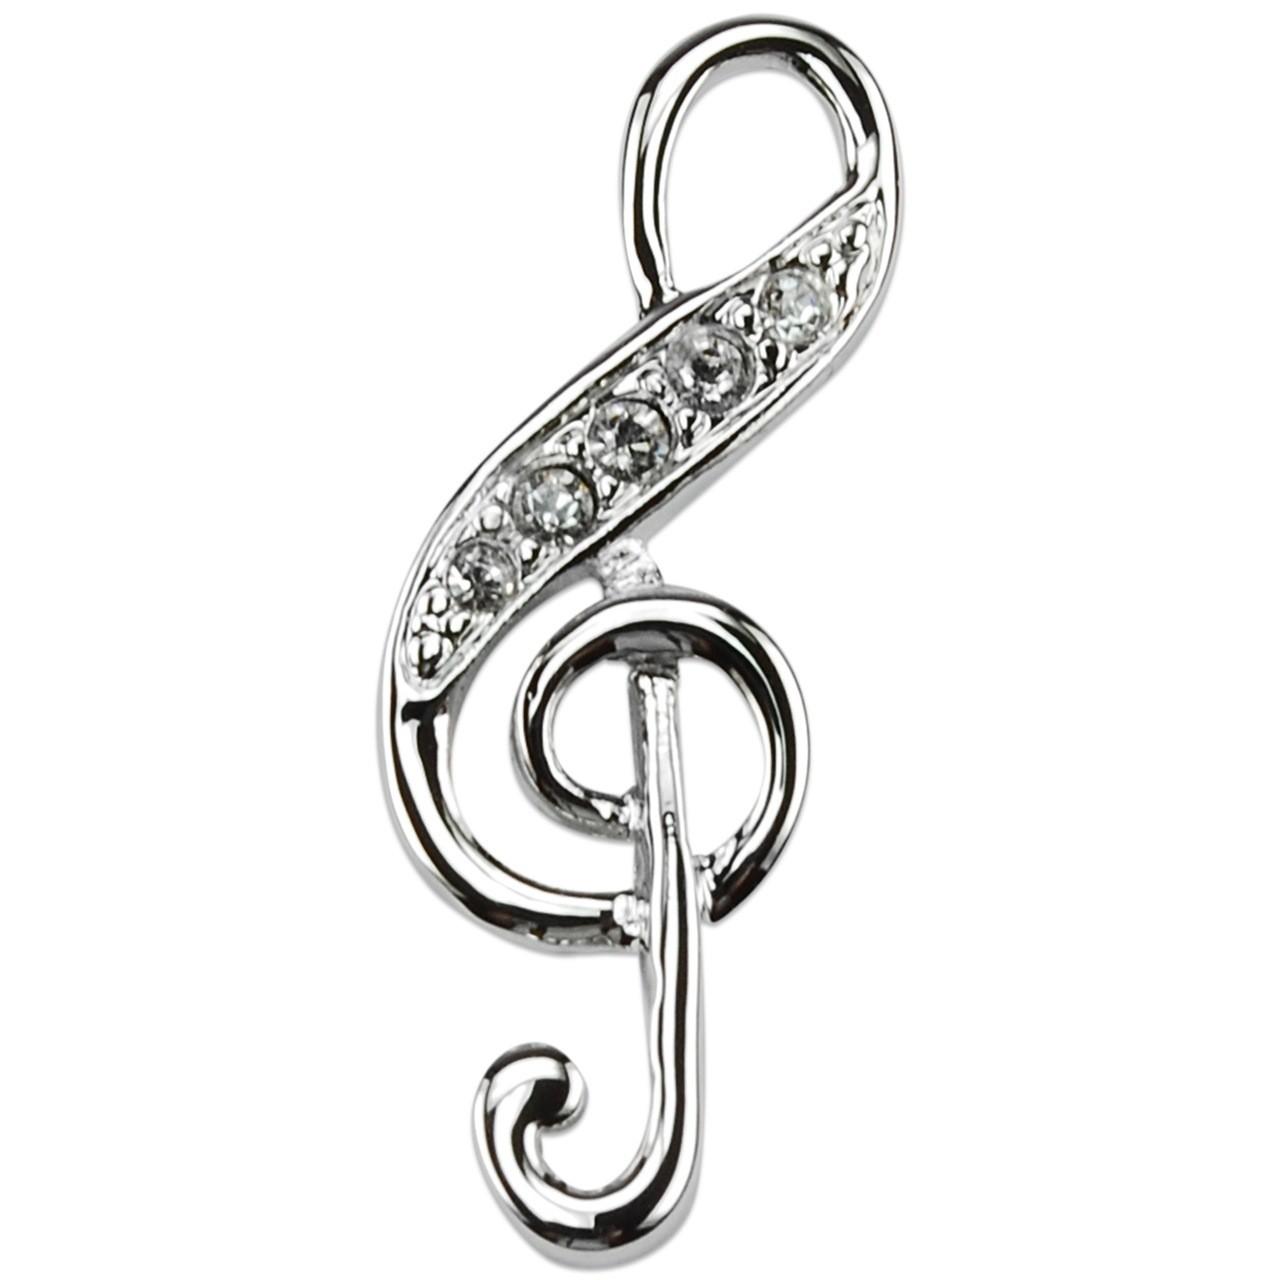 Crystalp Schmuck Anstecker Violinschlüssel